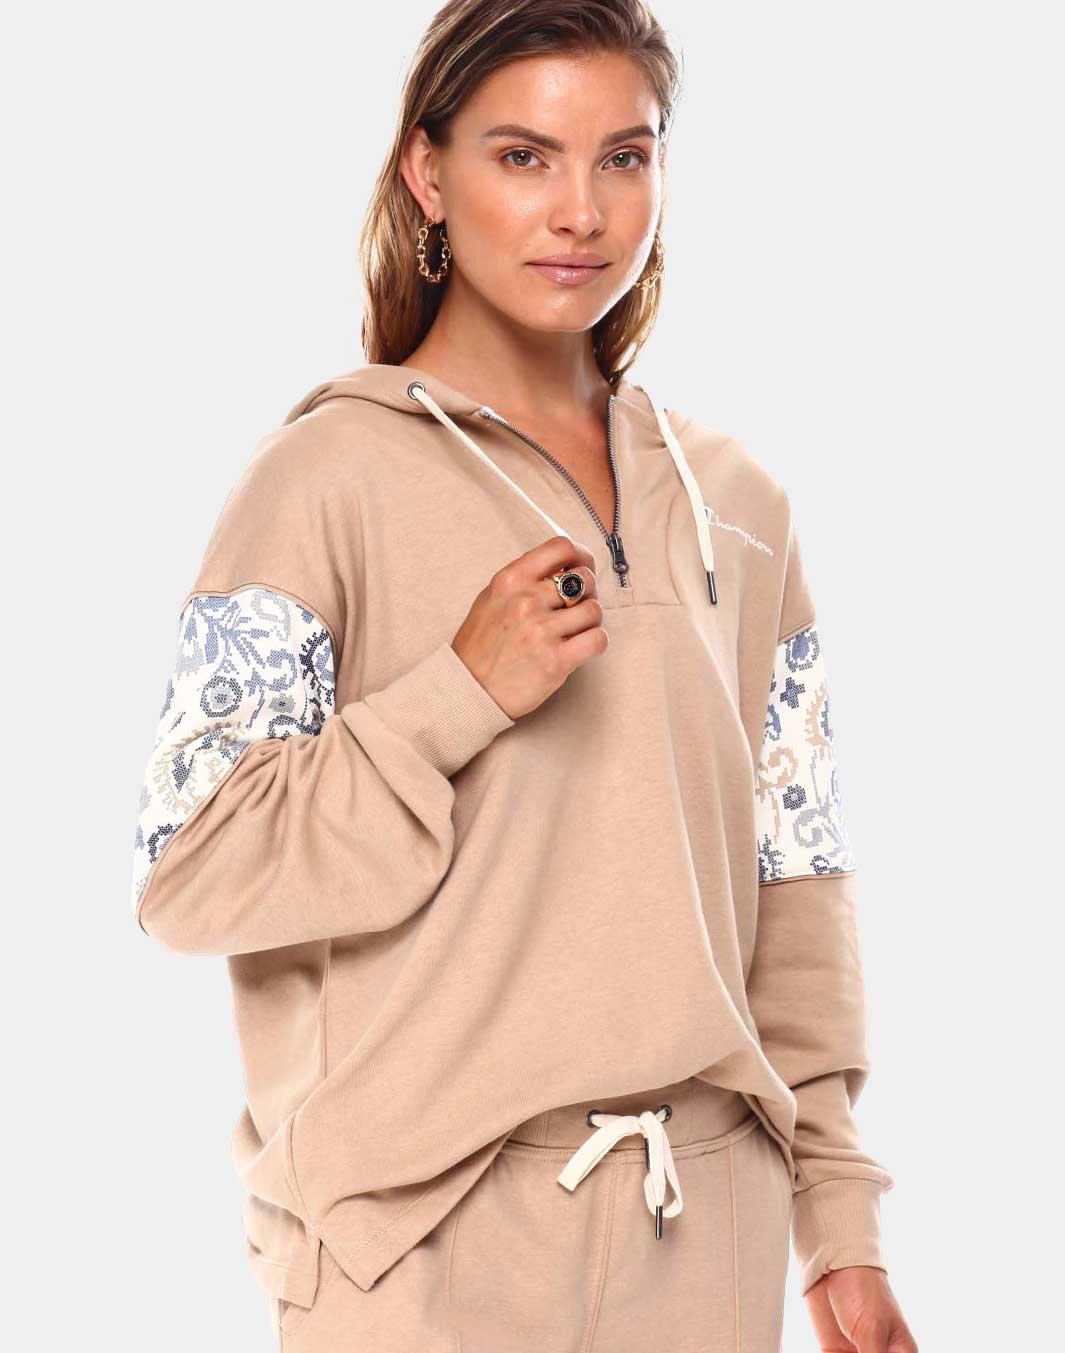 Hoodies for Women at DrJays.com